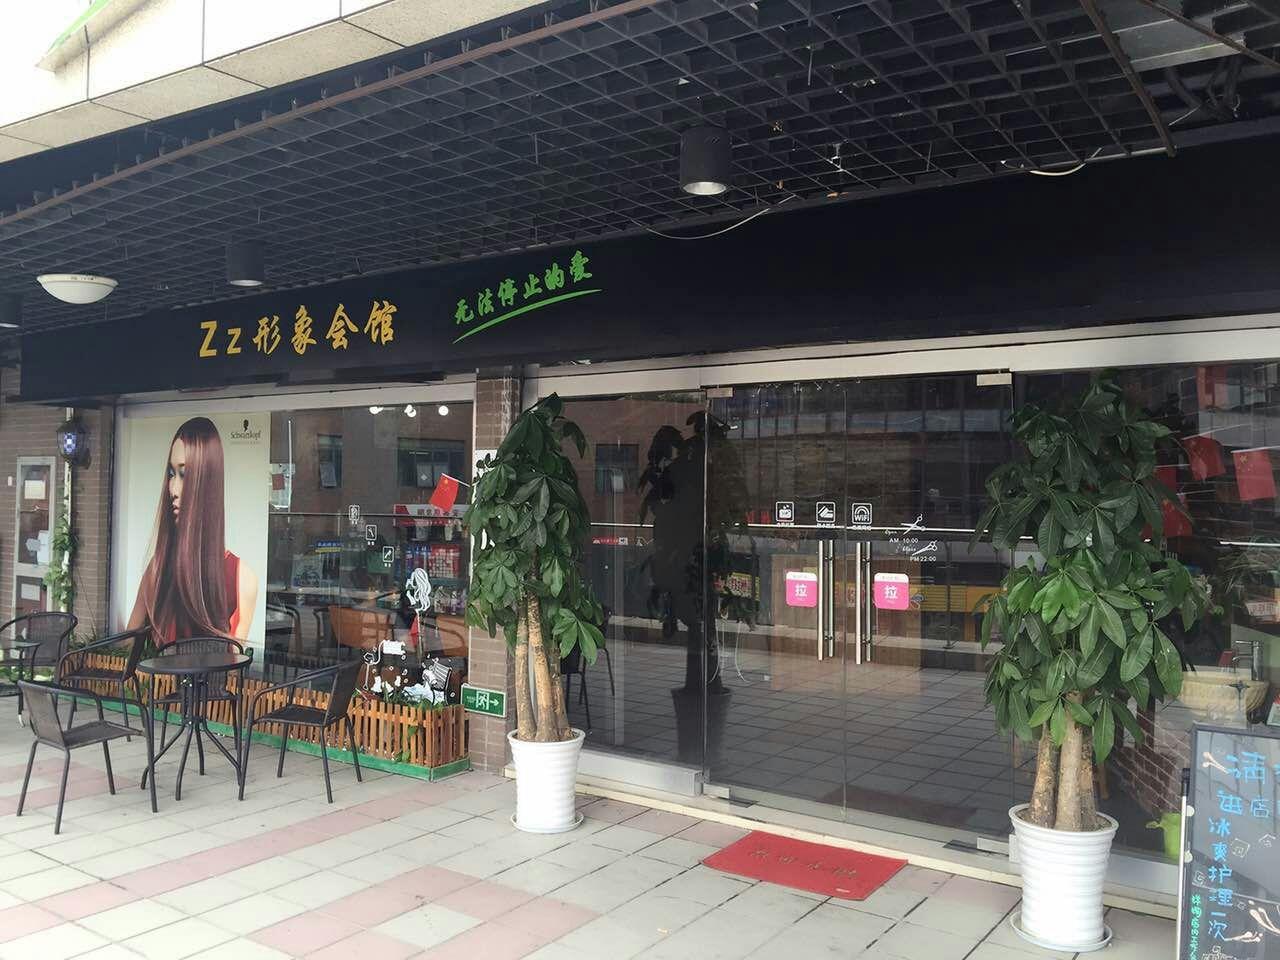 Zz形象会馆